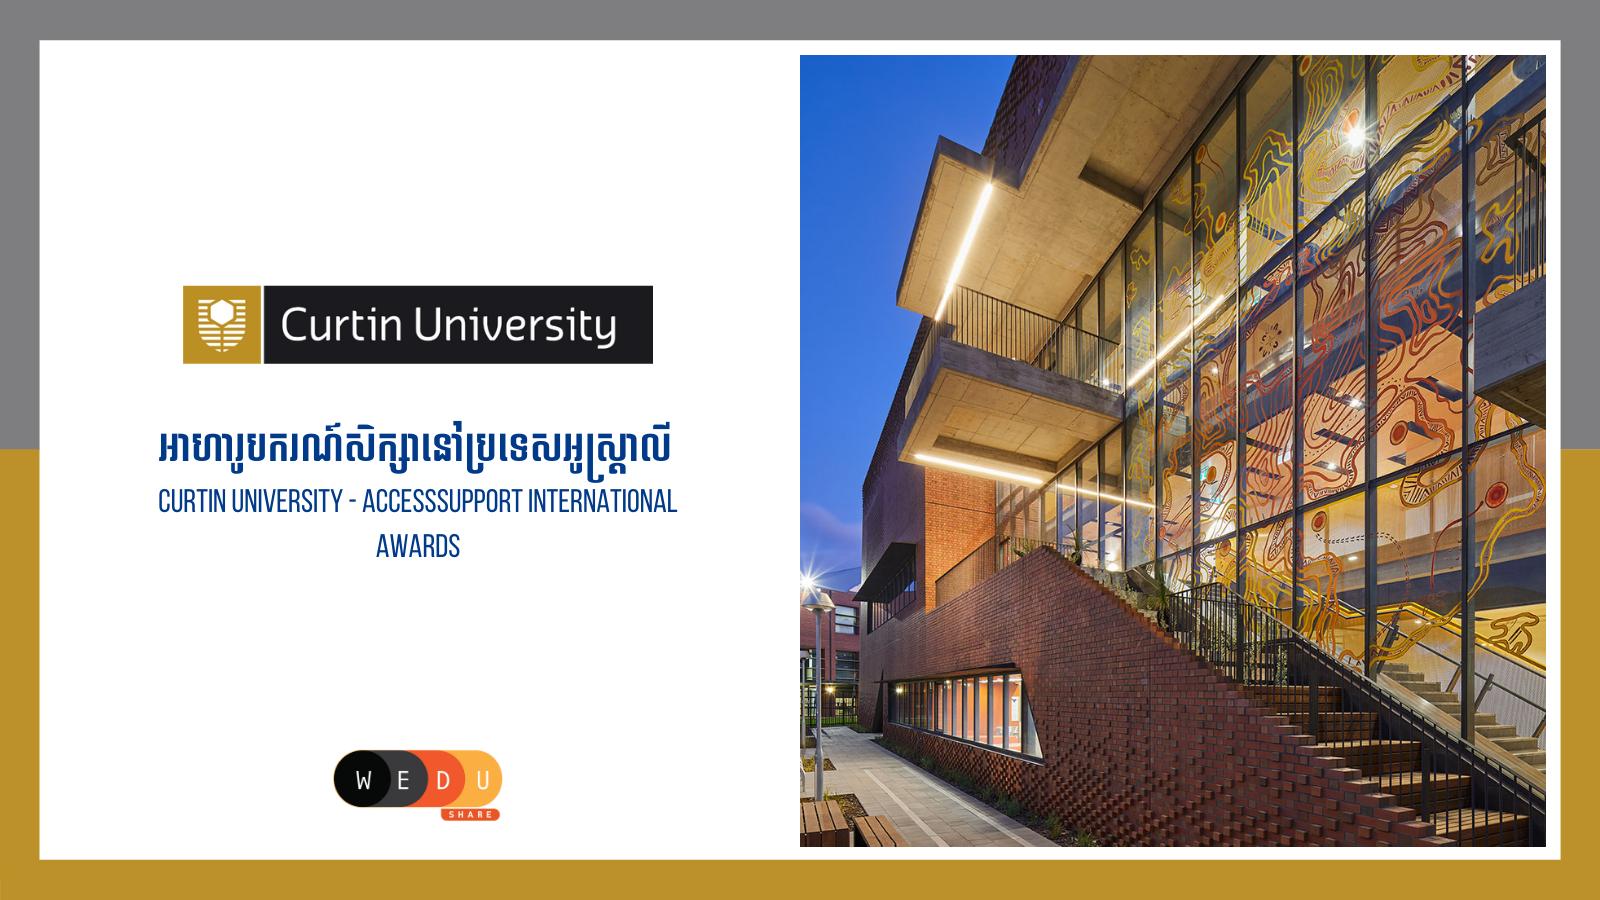 Curtin University - Access Support International Awards